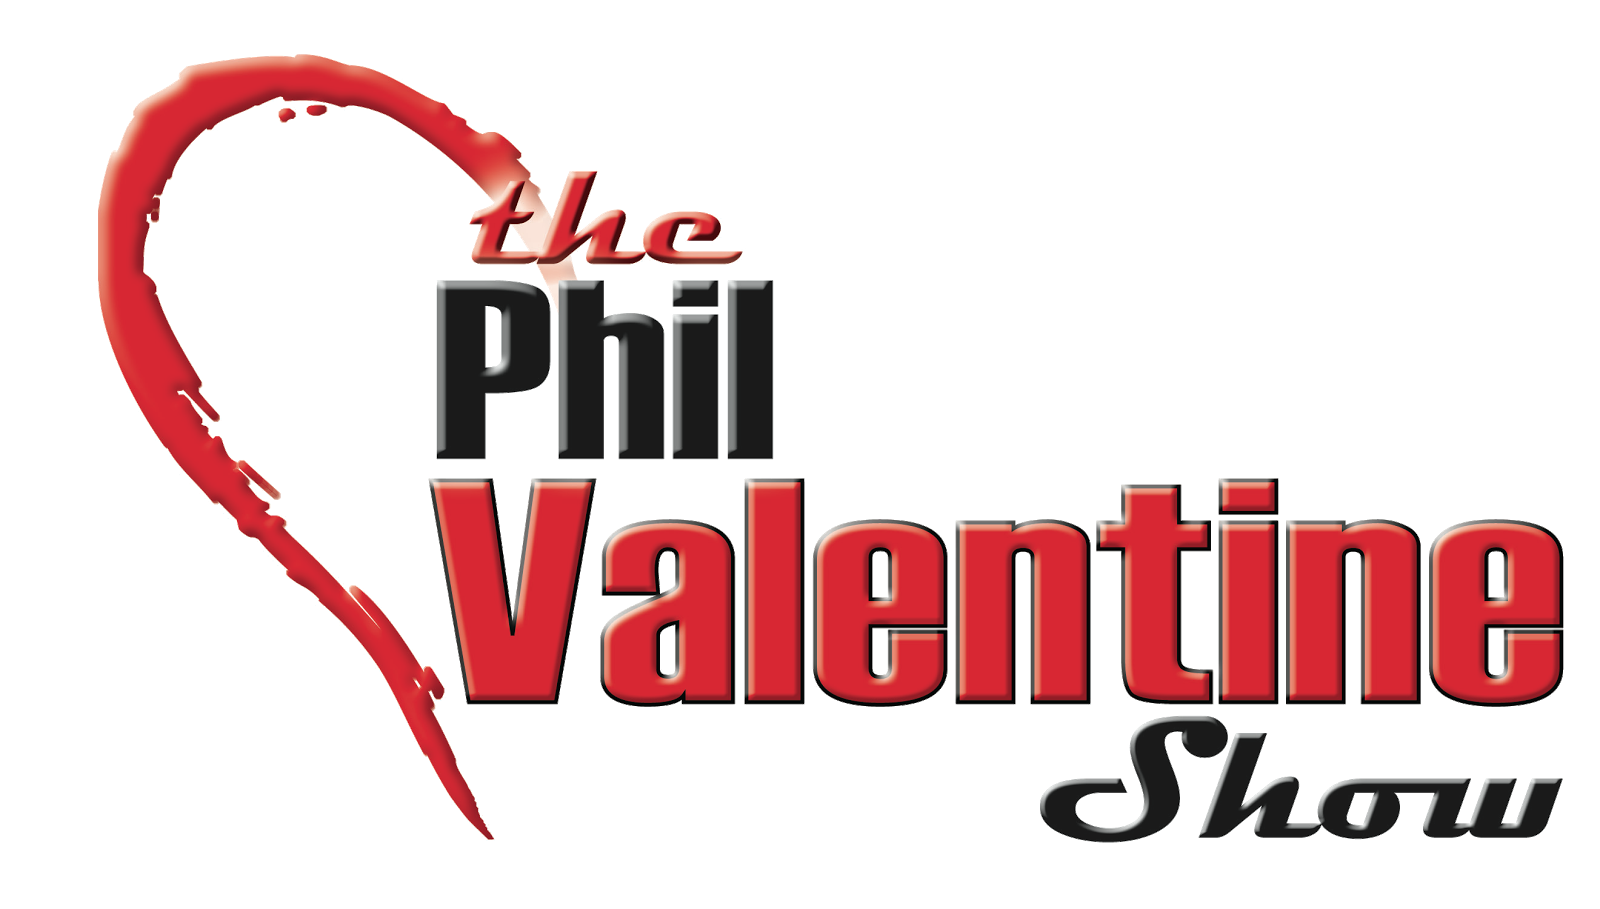 Phil Valentine Show